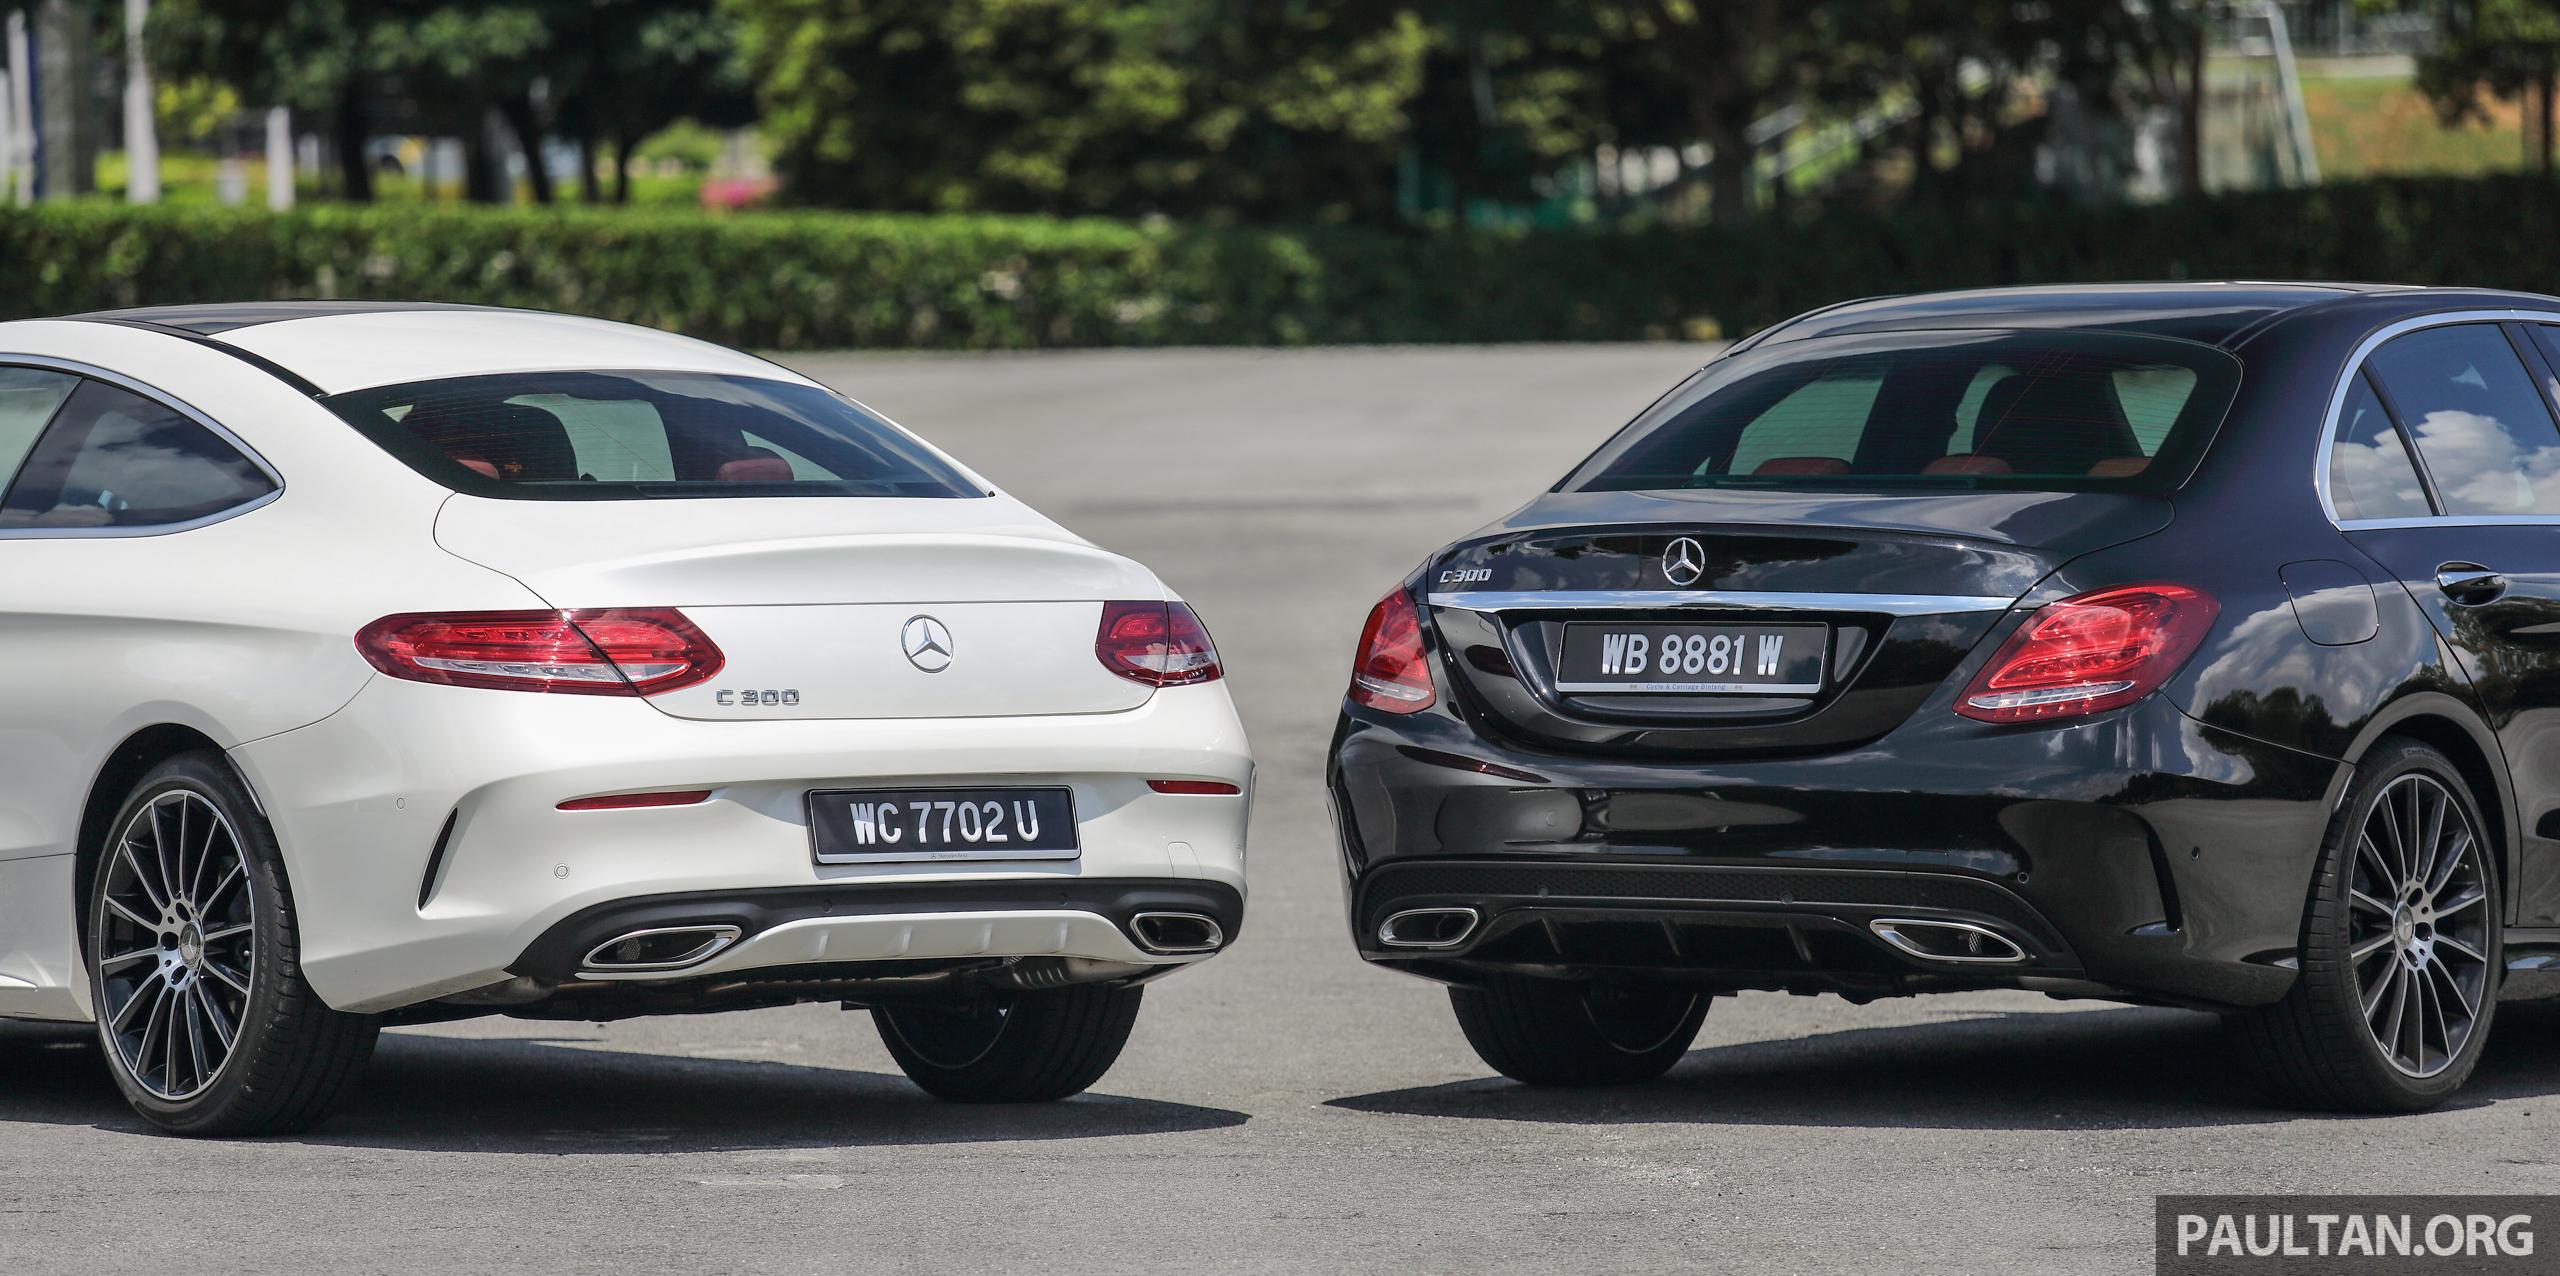 Gallery Mercedes Benz C300 Coupe Vs Sedan Paul Tan Image 495919